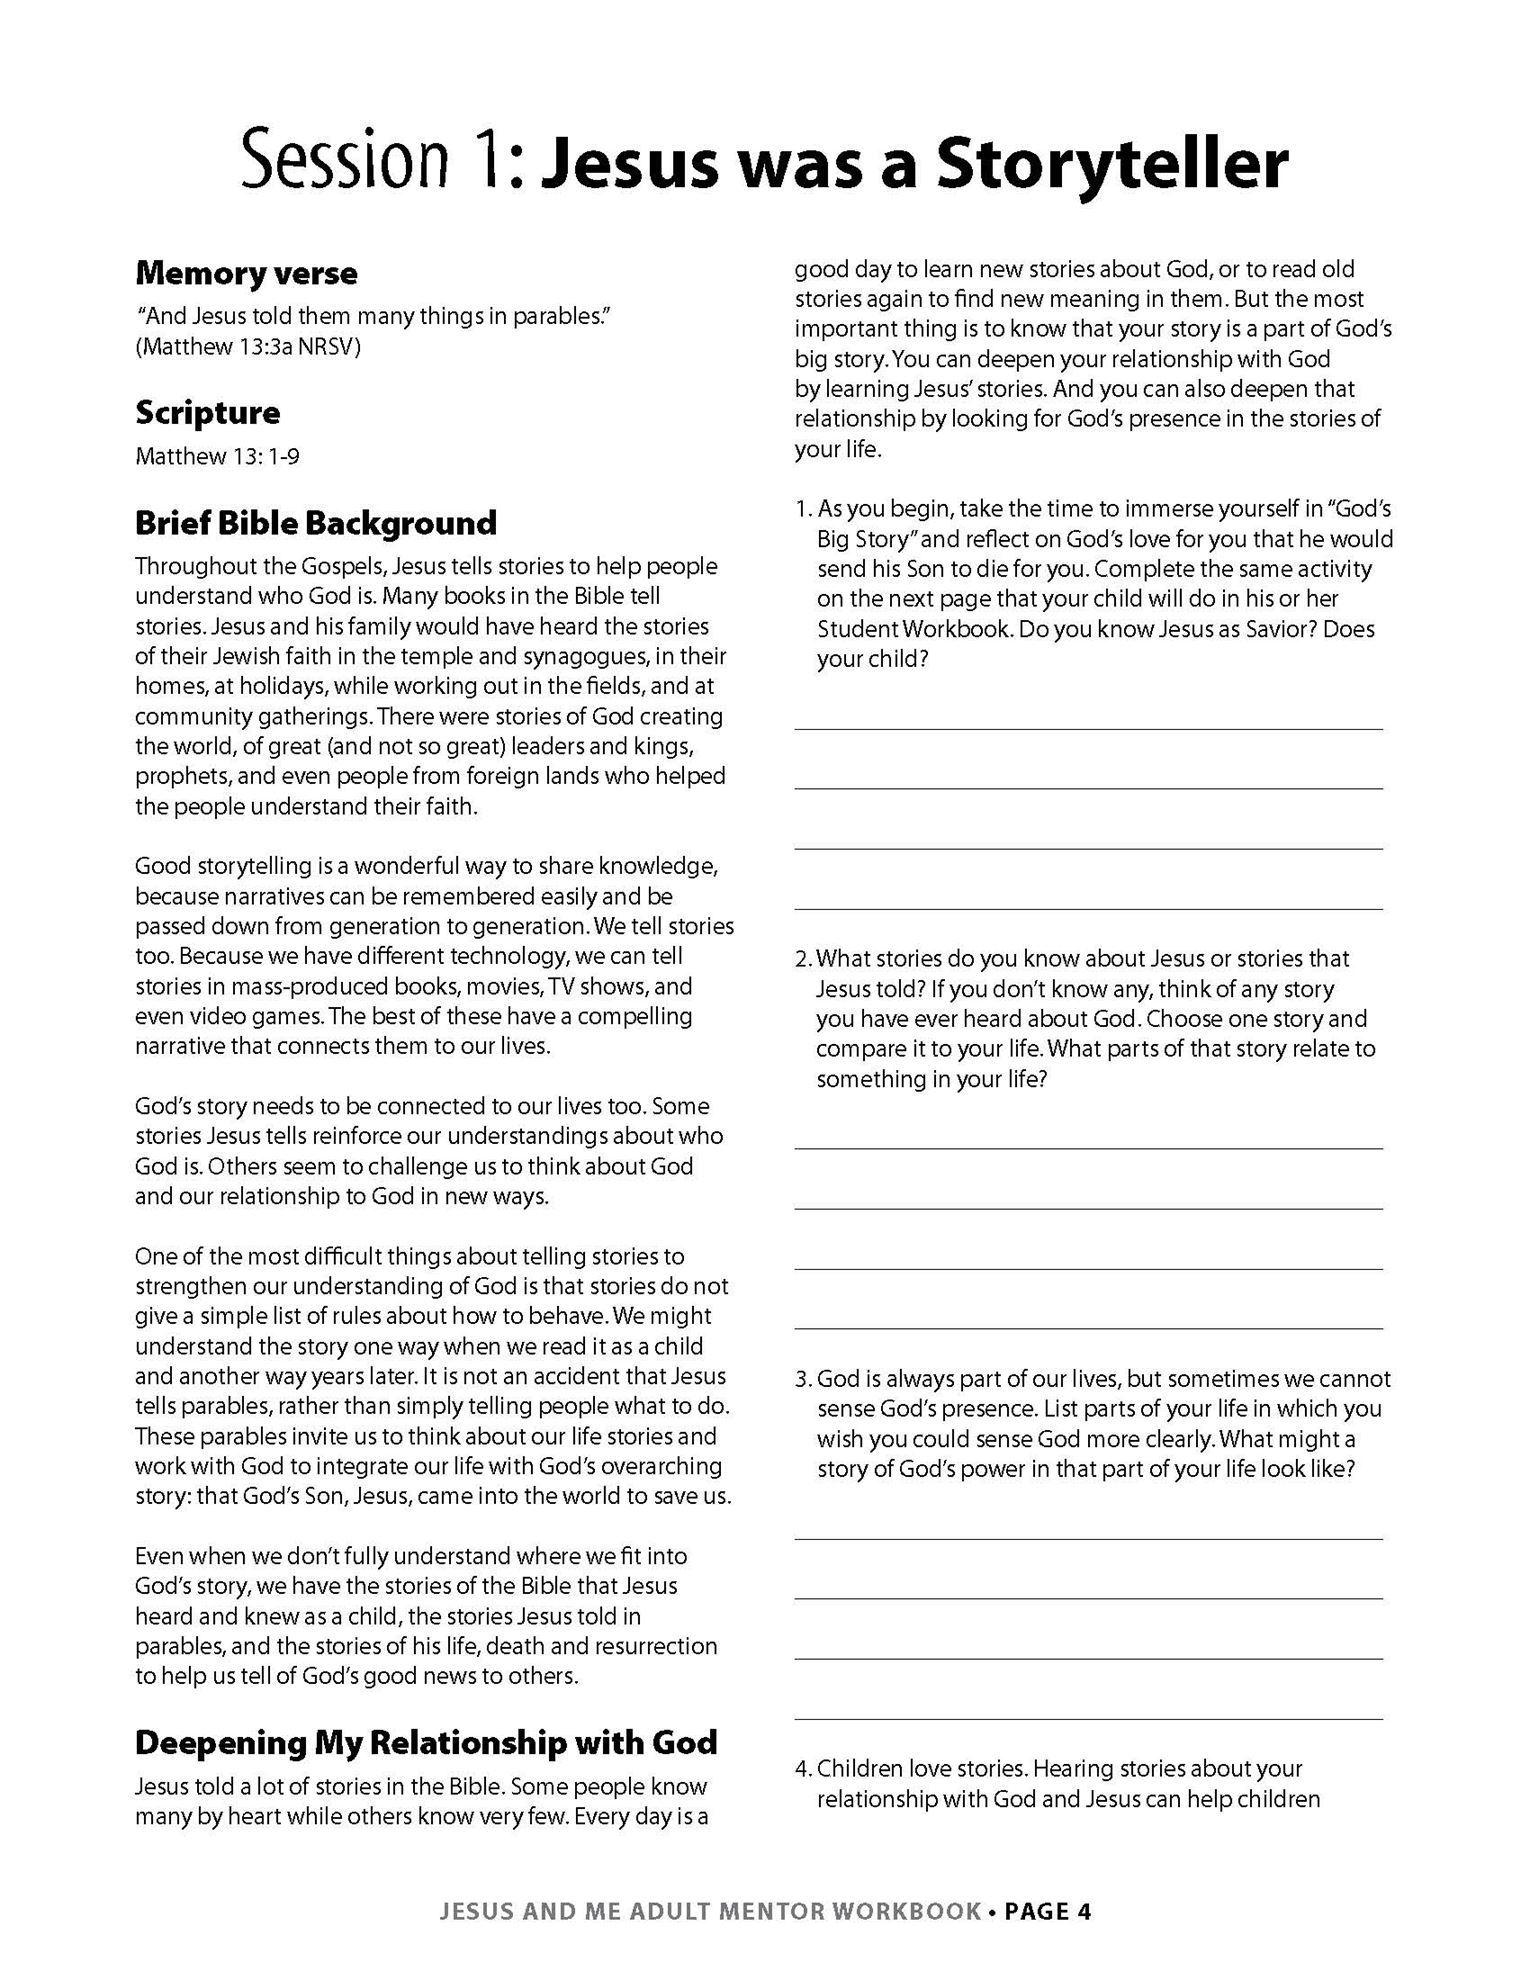 Jesus & Me Mentor Workbook Lesson 1 Page 1